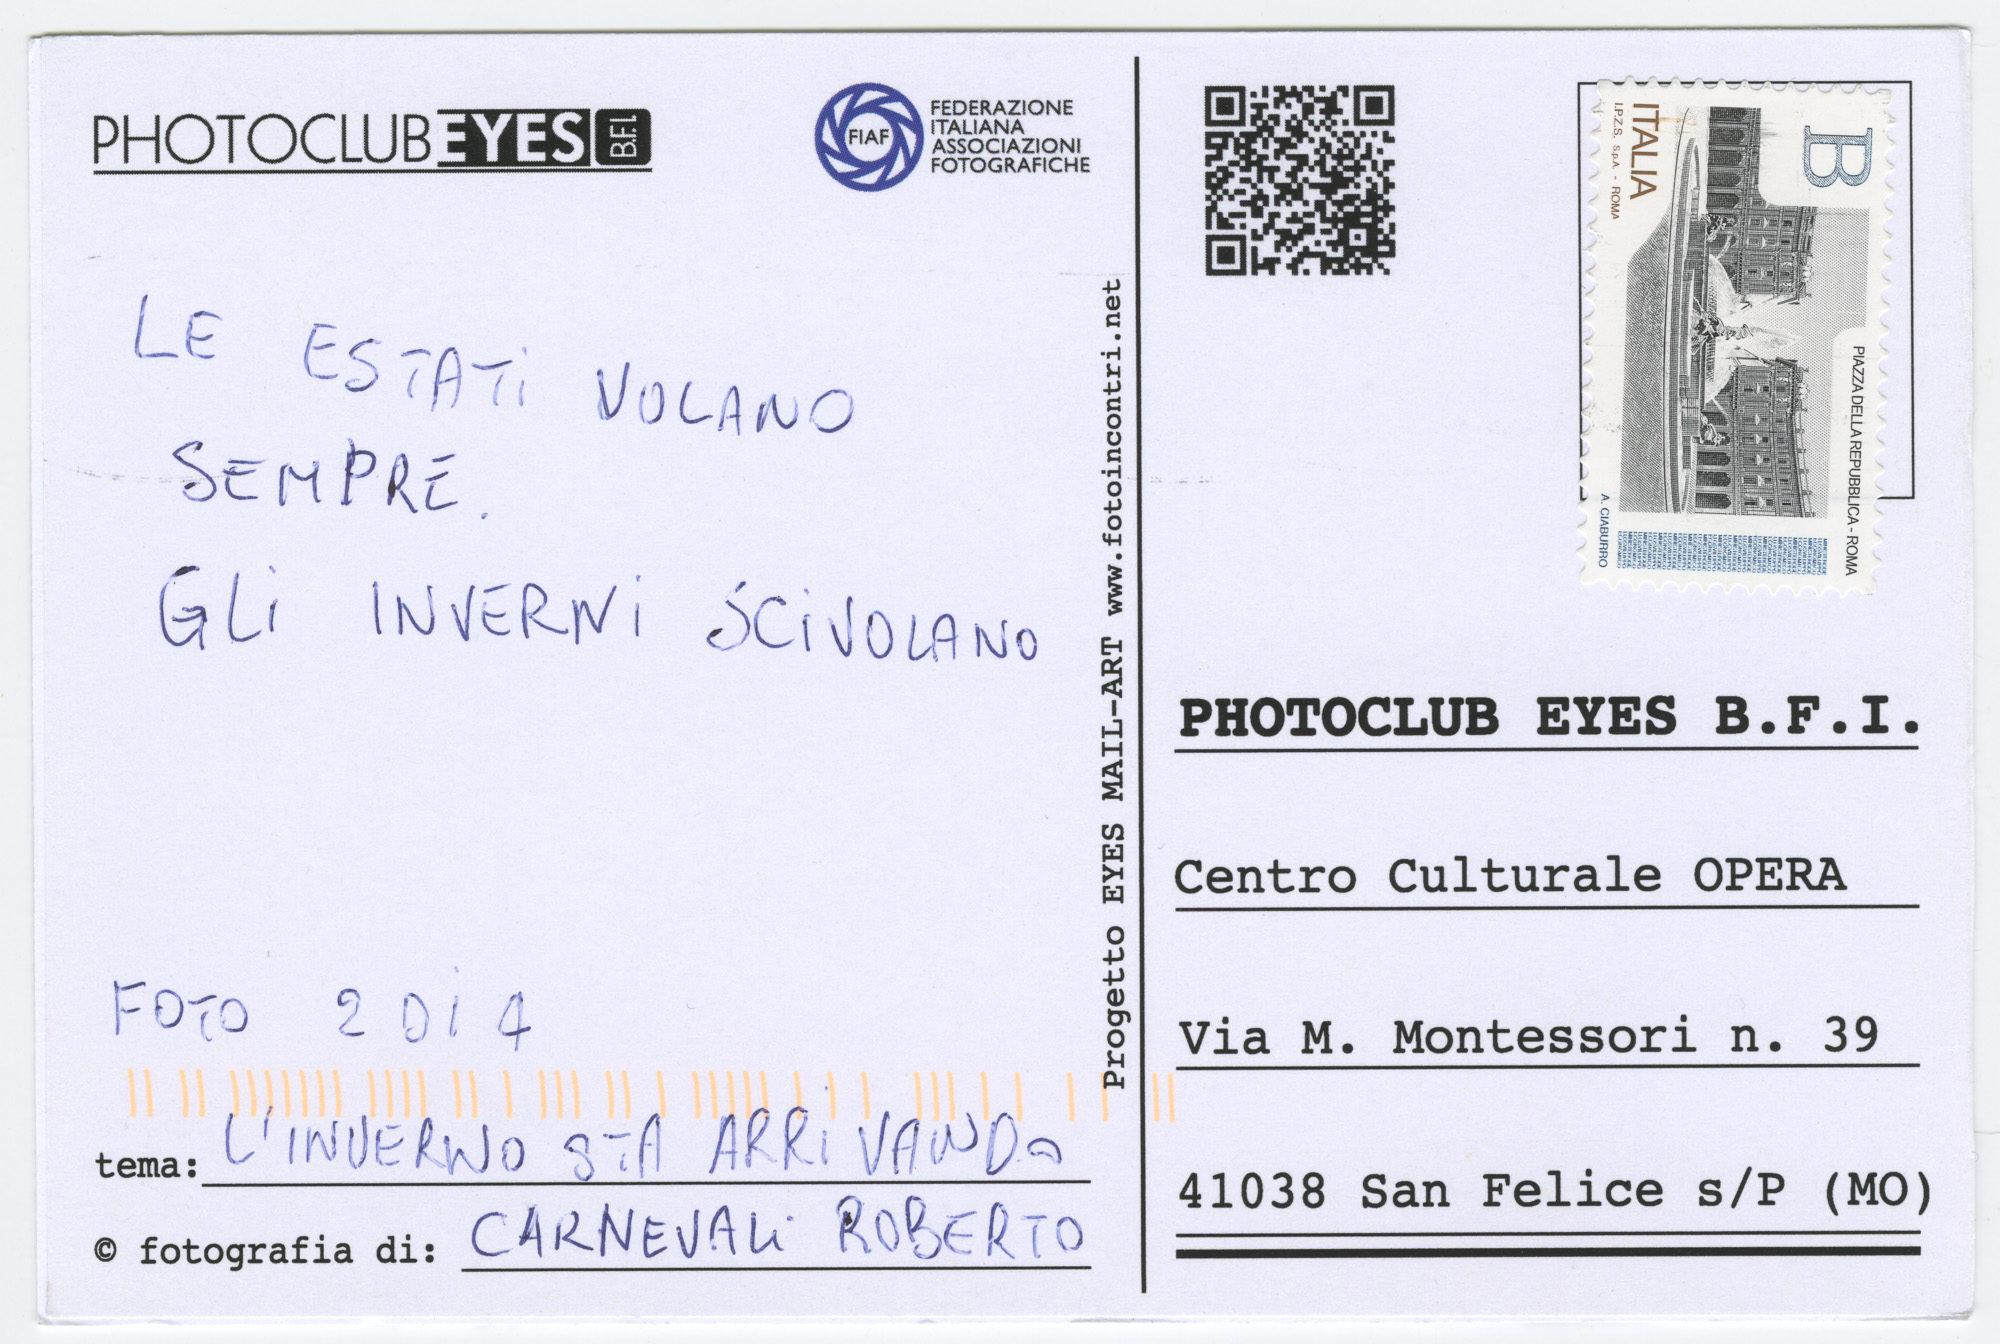 Roberto Carnevali